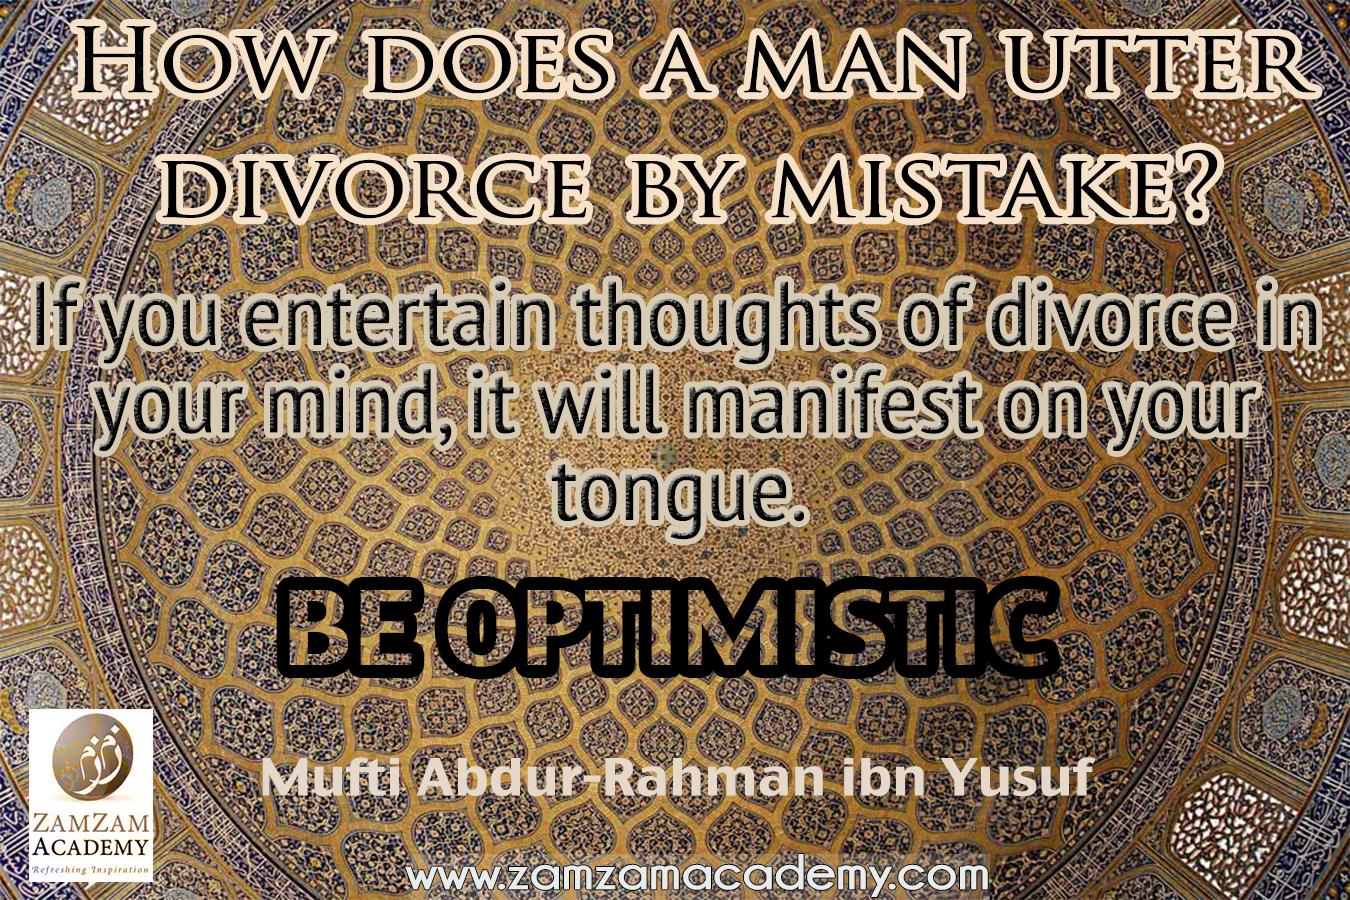 Divorce Quotes Quotesmufti Abdurrahman Ibn Yusuf  Zamzam Academy